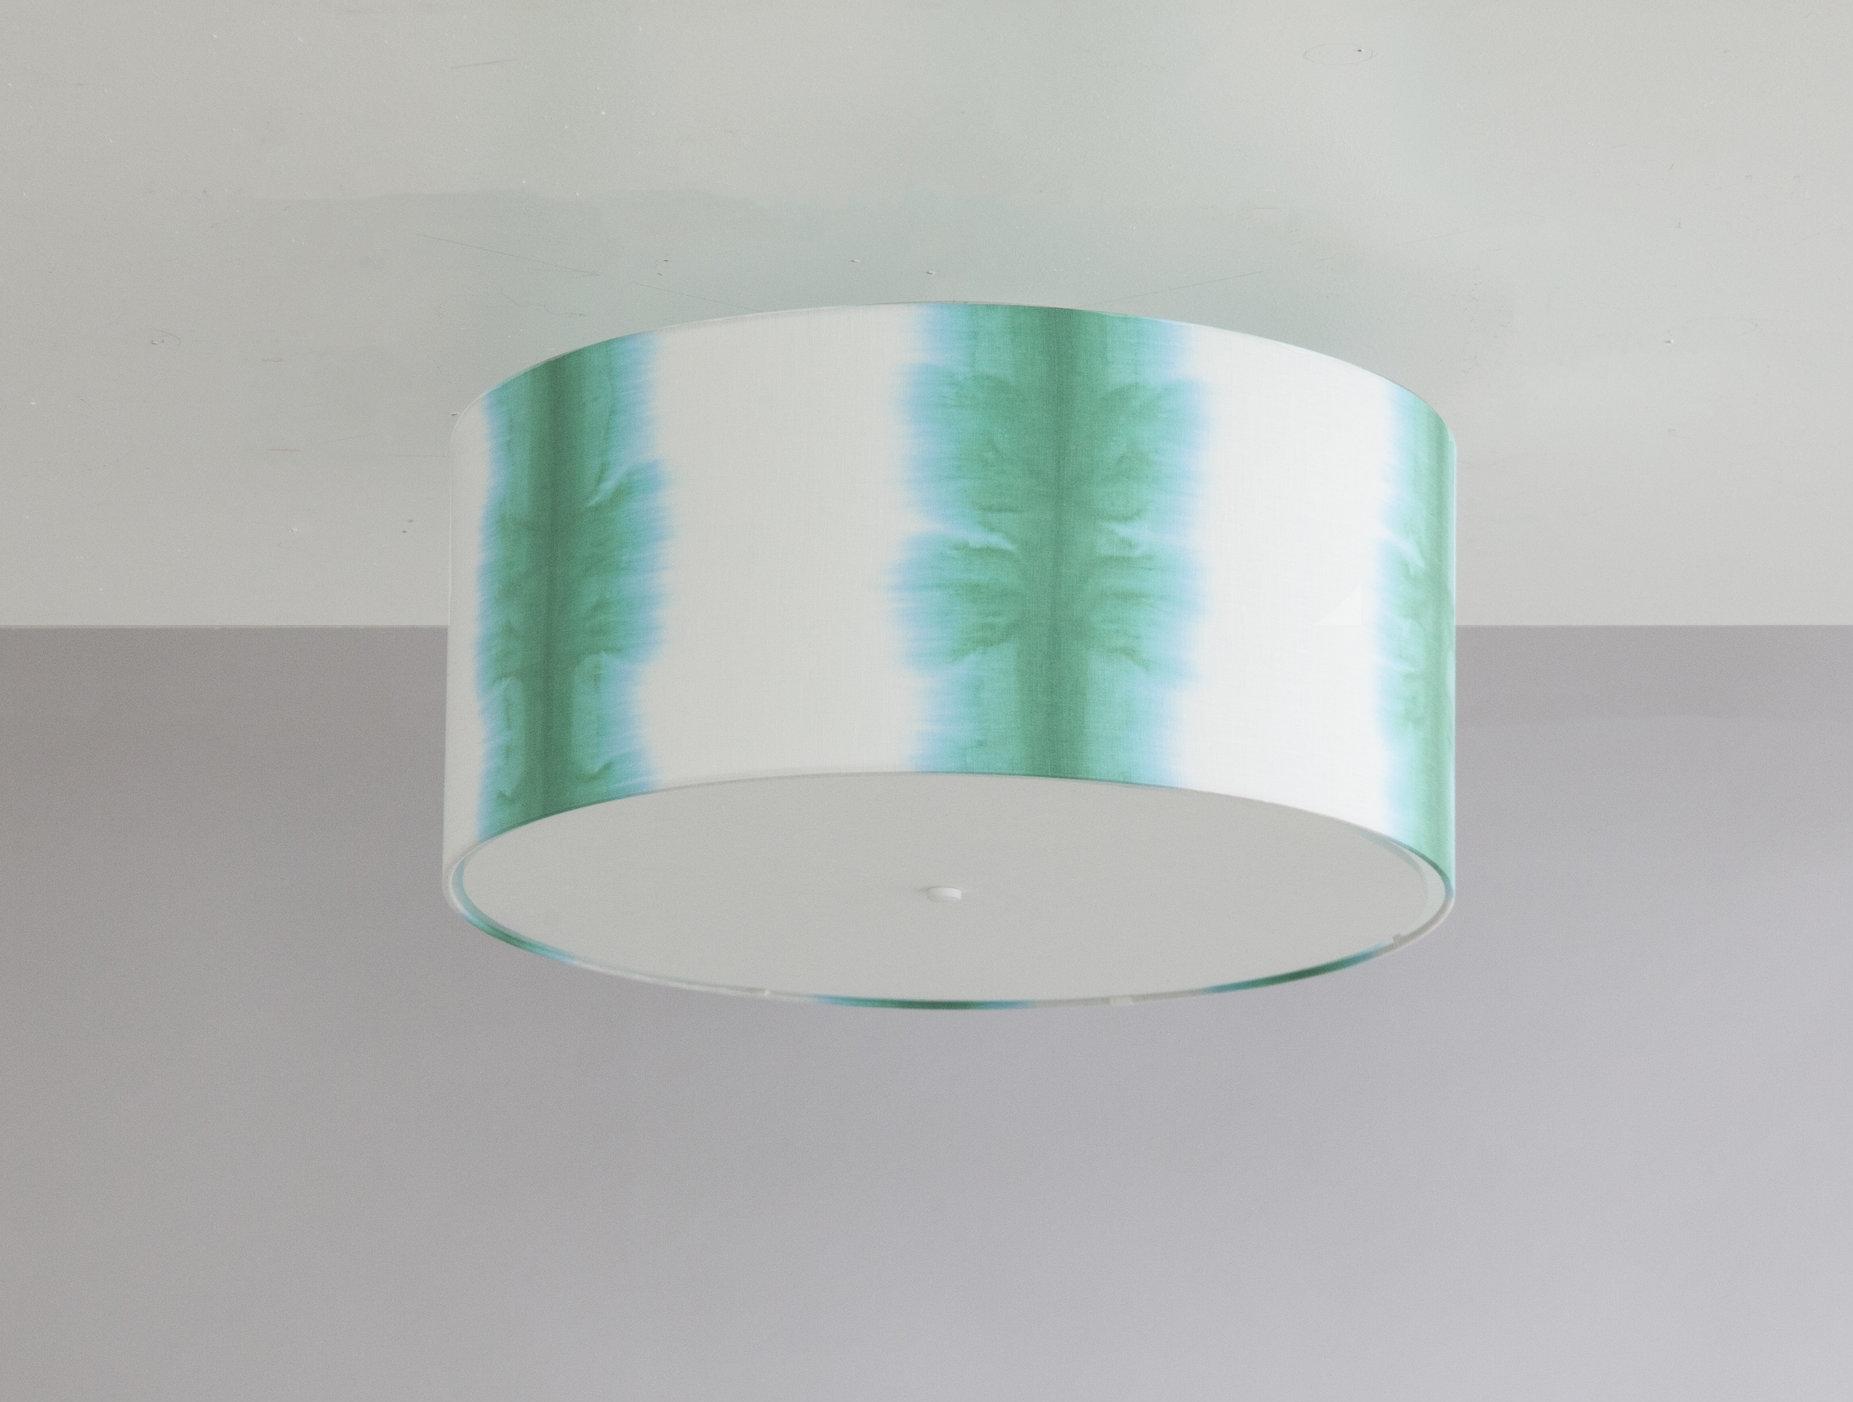 Bone Simple Design_Shibori Vertical Stripe Drum Ceiling Fixture_Emerald Green.jpg